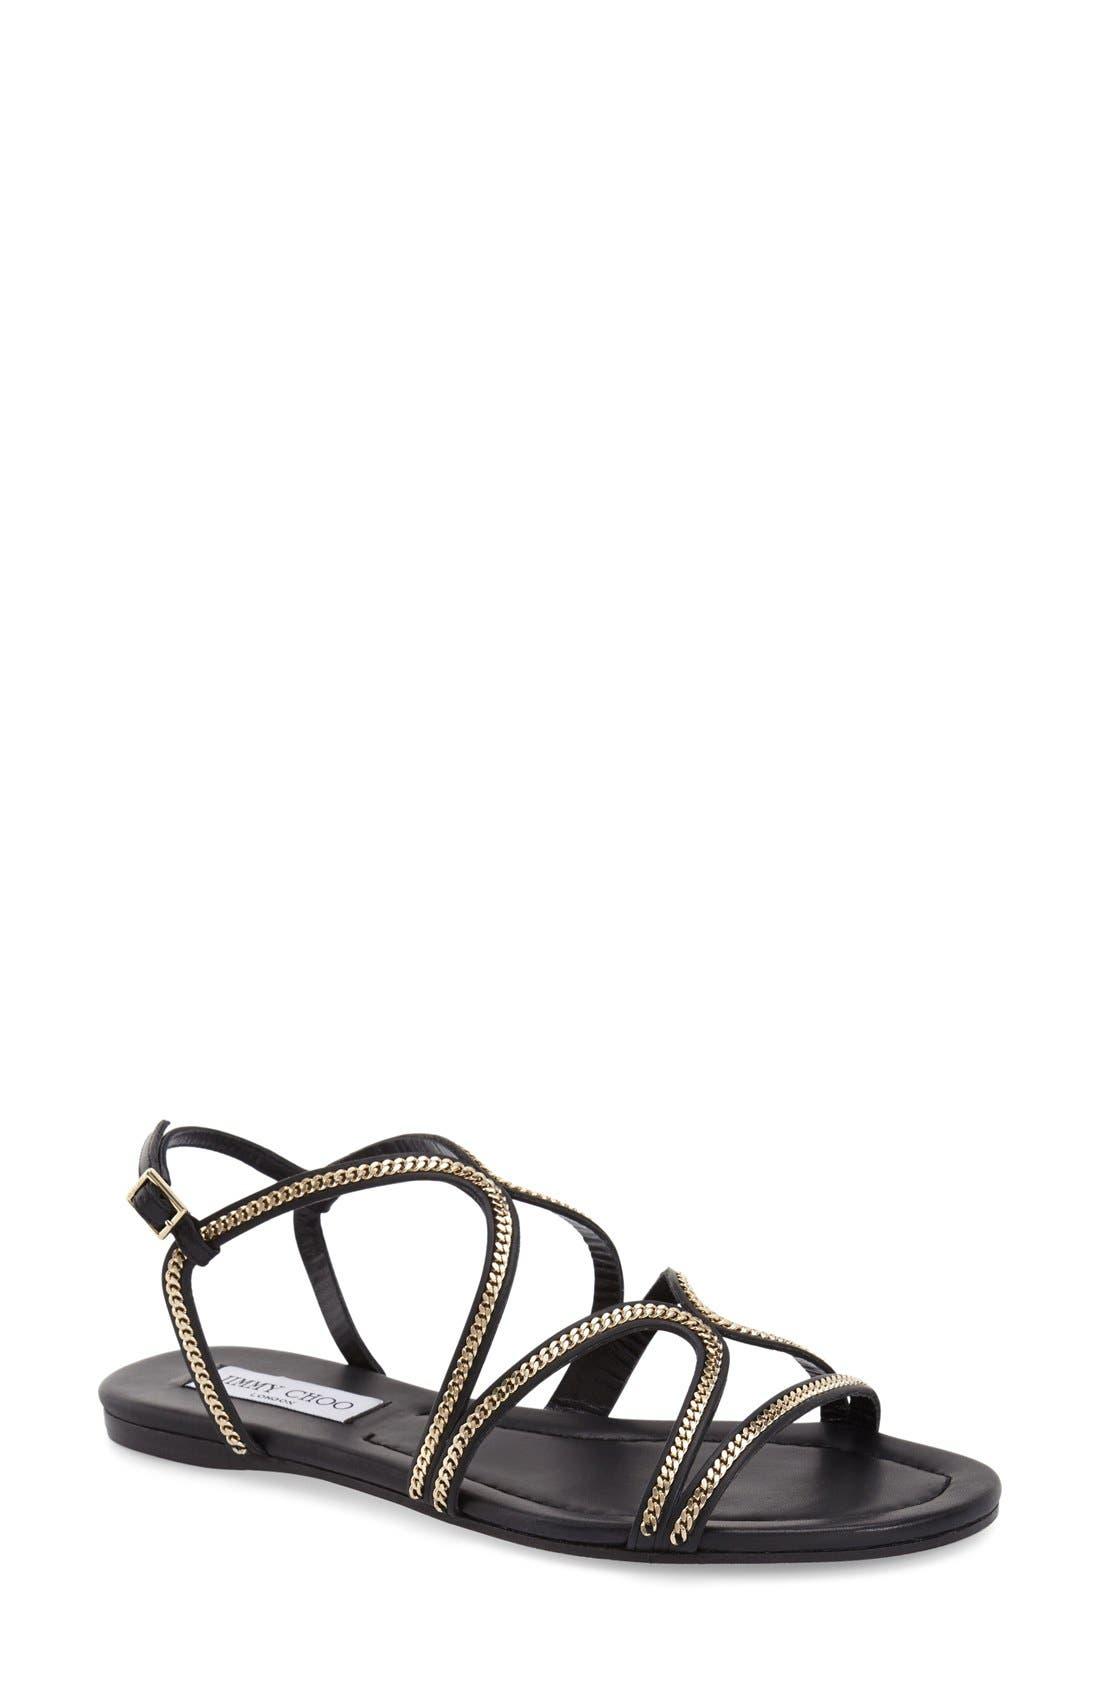 'Nickel' Sandal,                         Main,                         color, 001